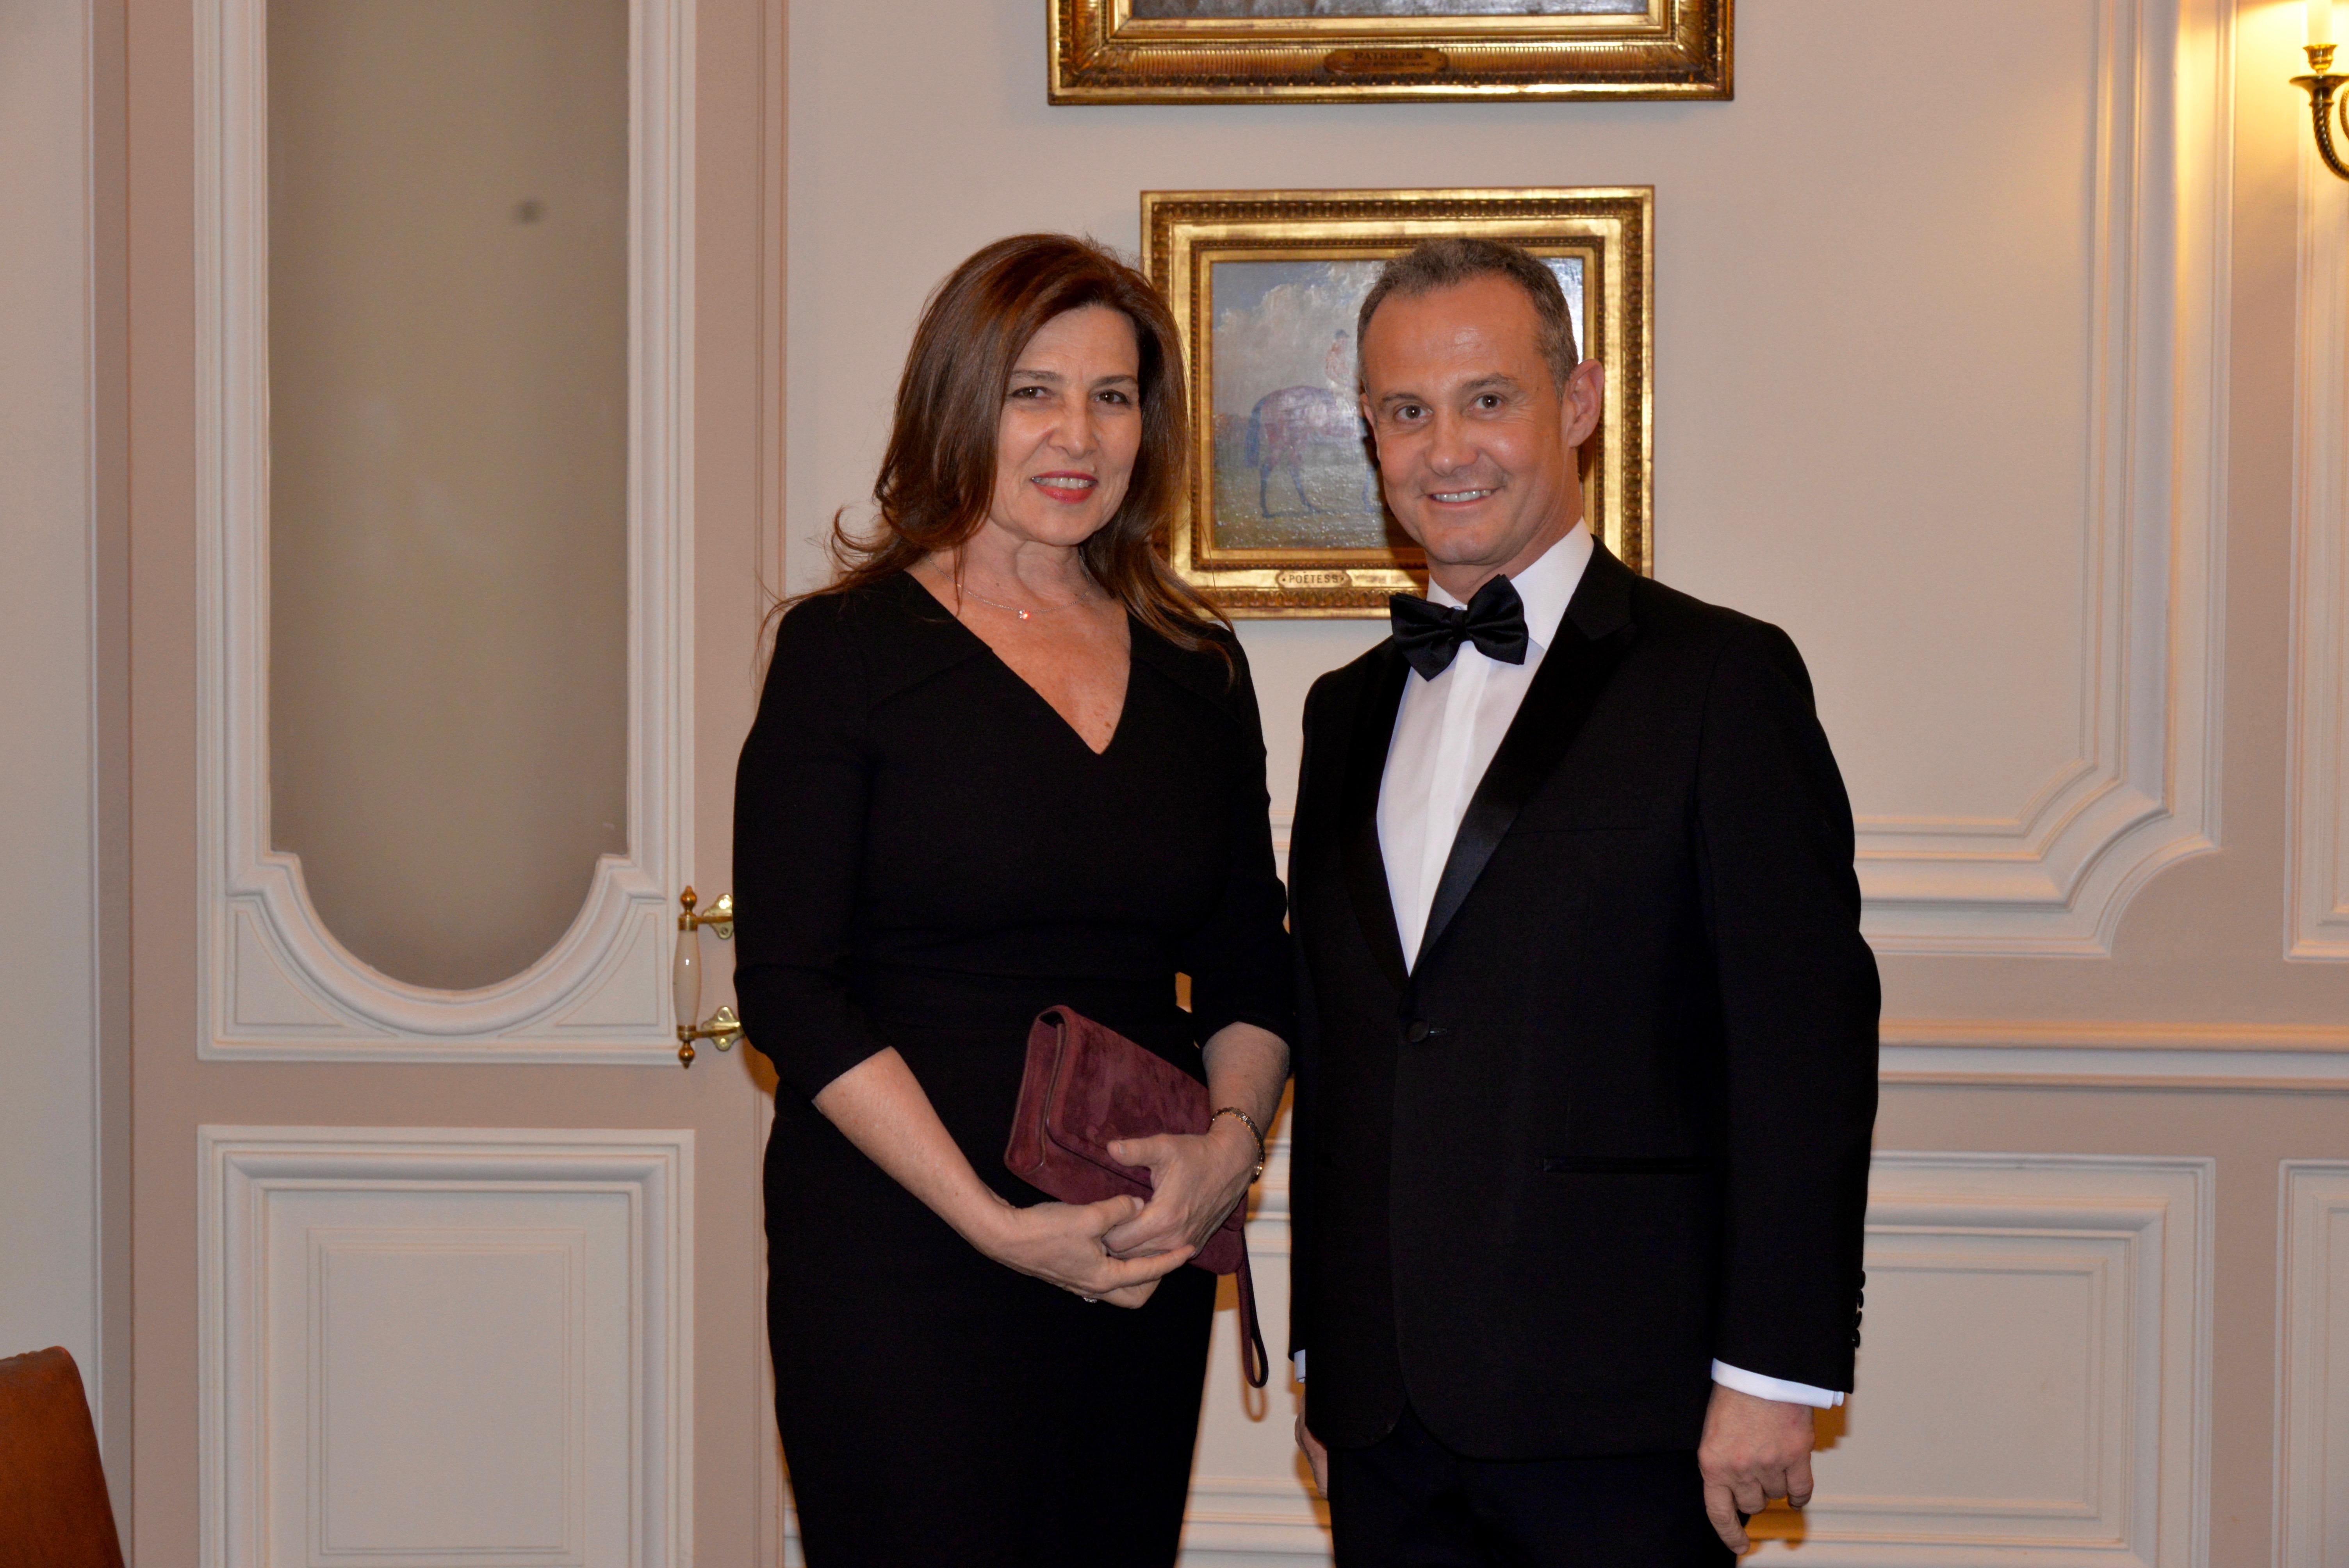 Aliza BIN-NOUN, ambassadrice d'Israël en France et à Monaco - Francis BAILLET